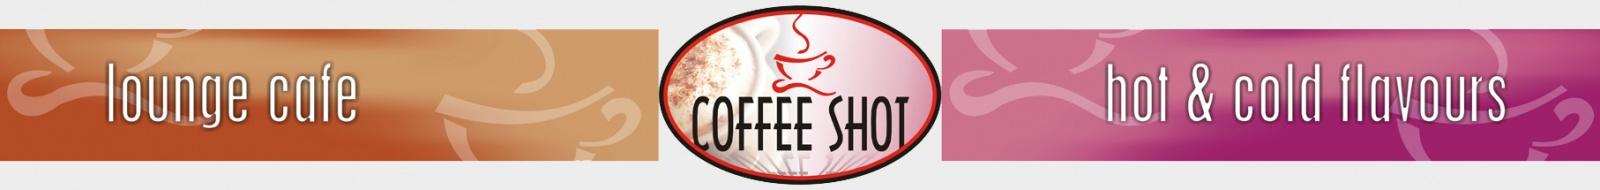 tampelacoffee